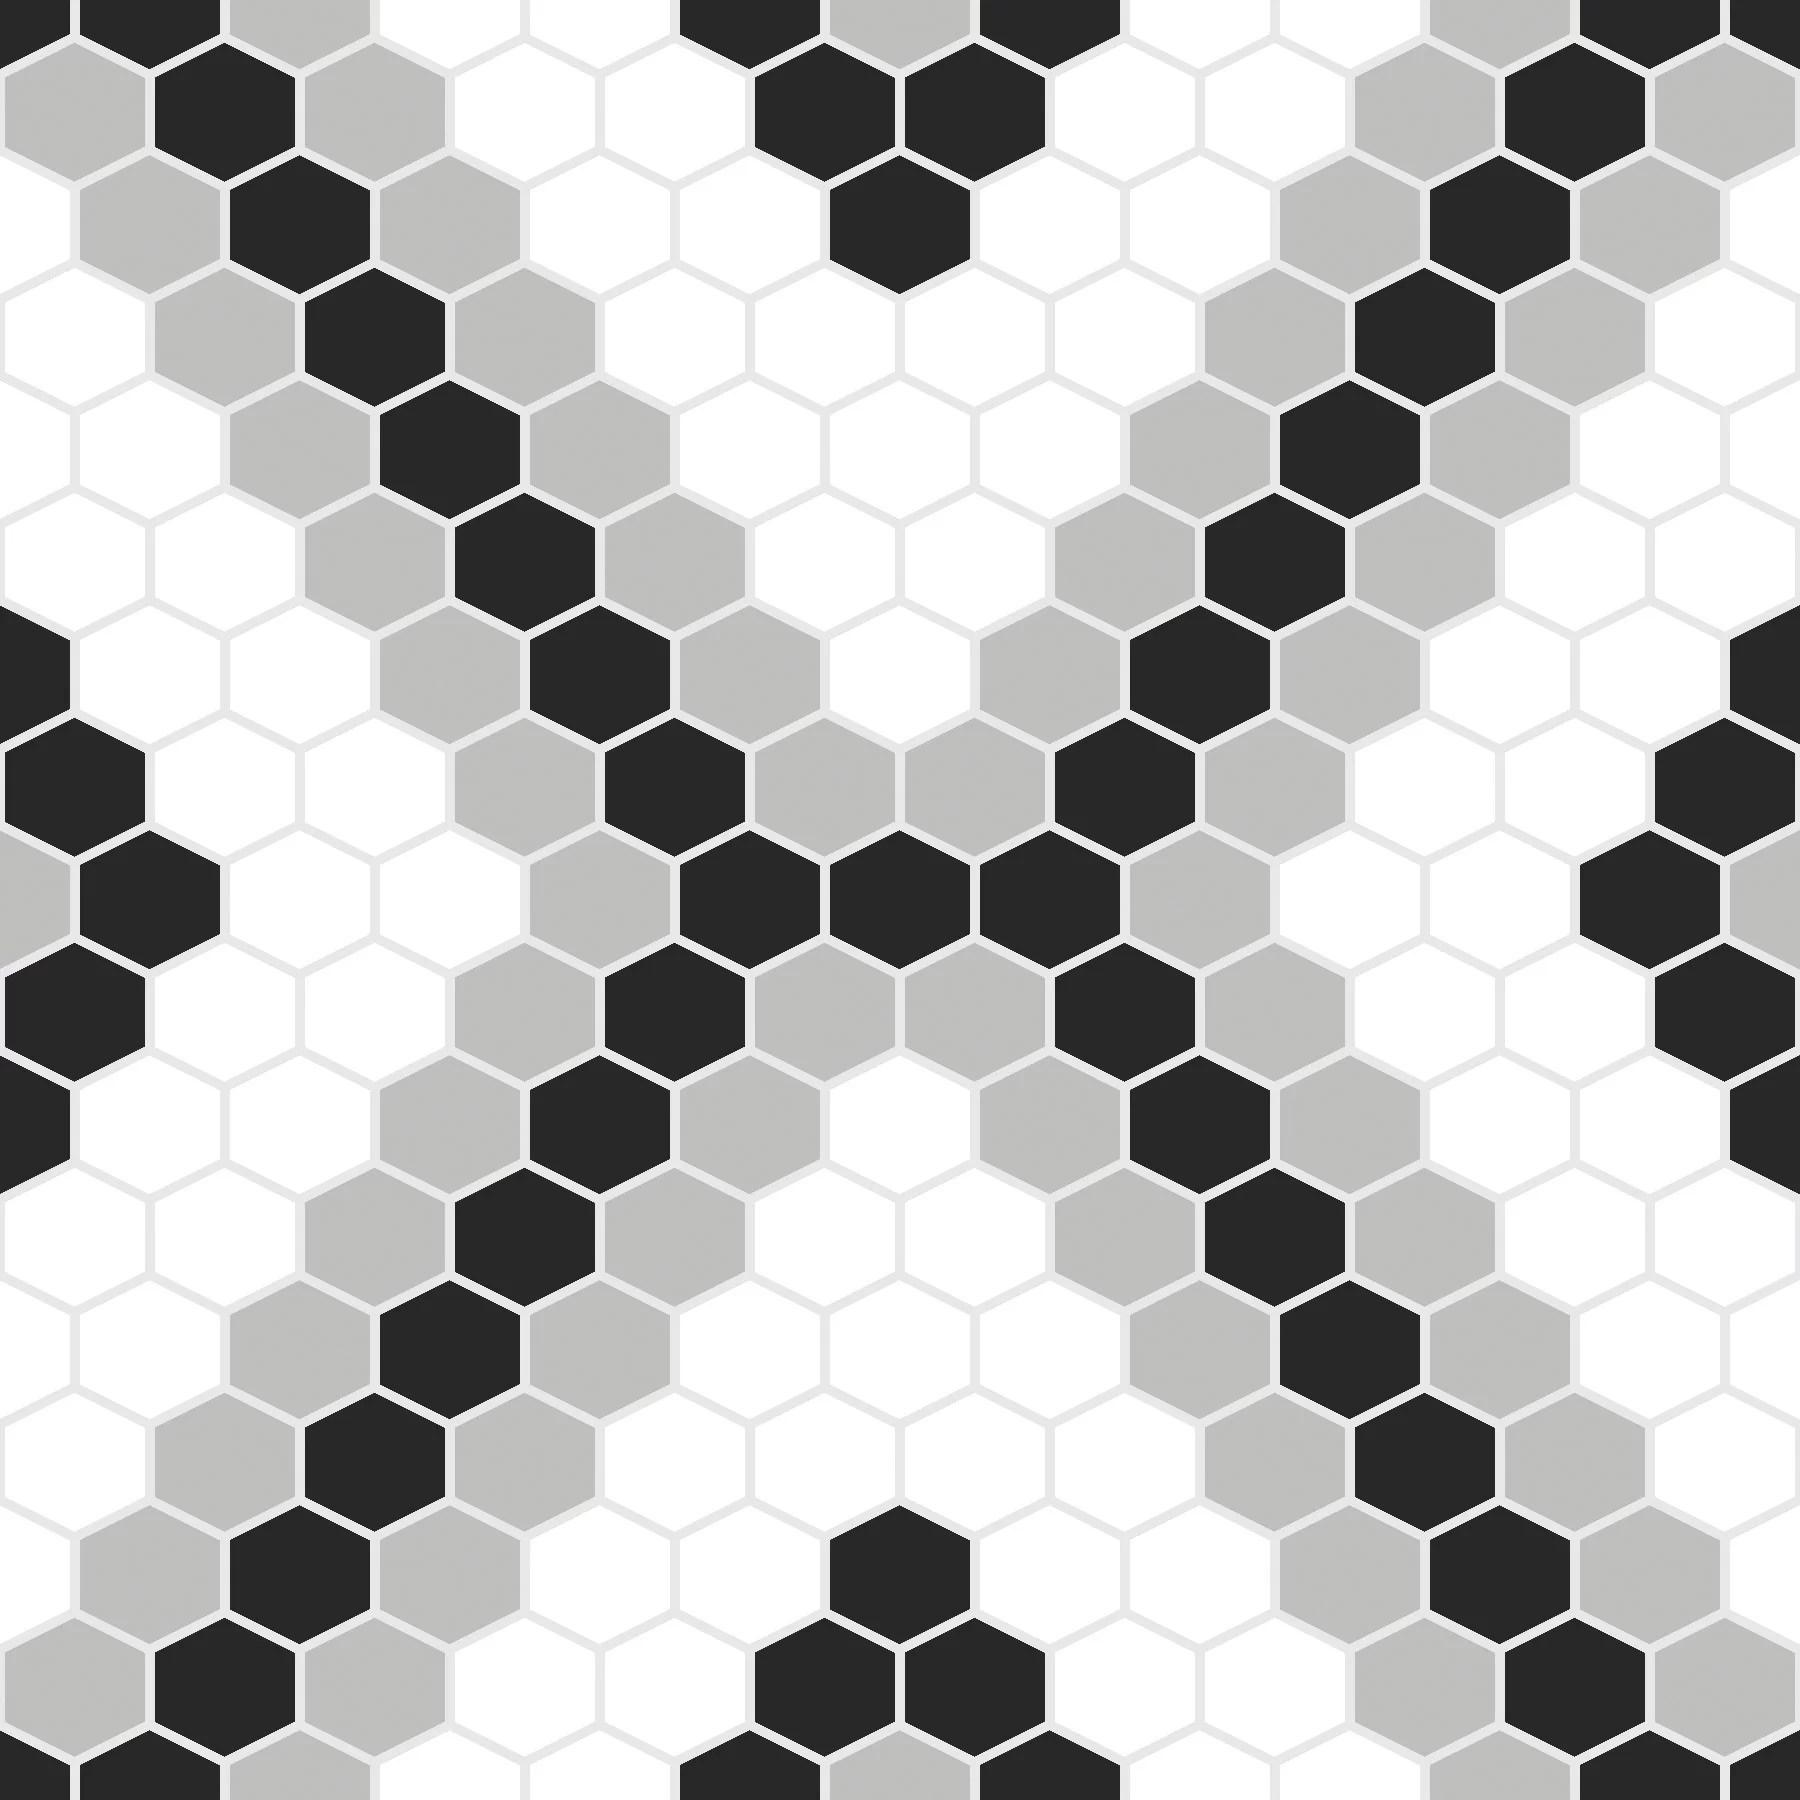 leyton peel and stick 12 x 12 x 0 1mm vinyl tile